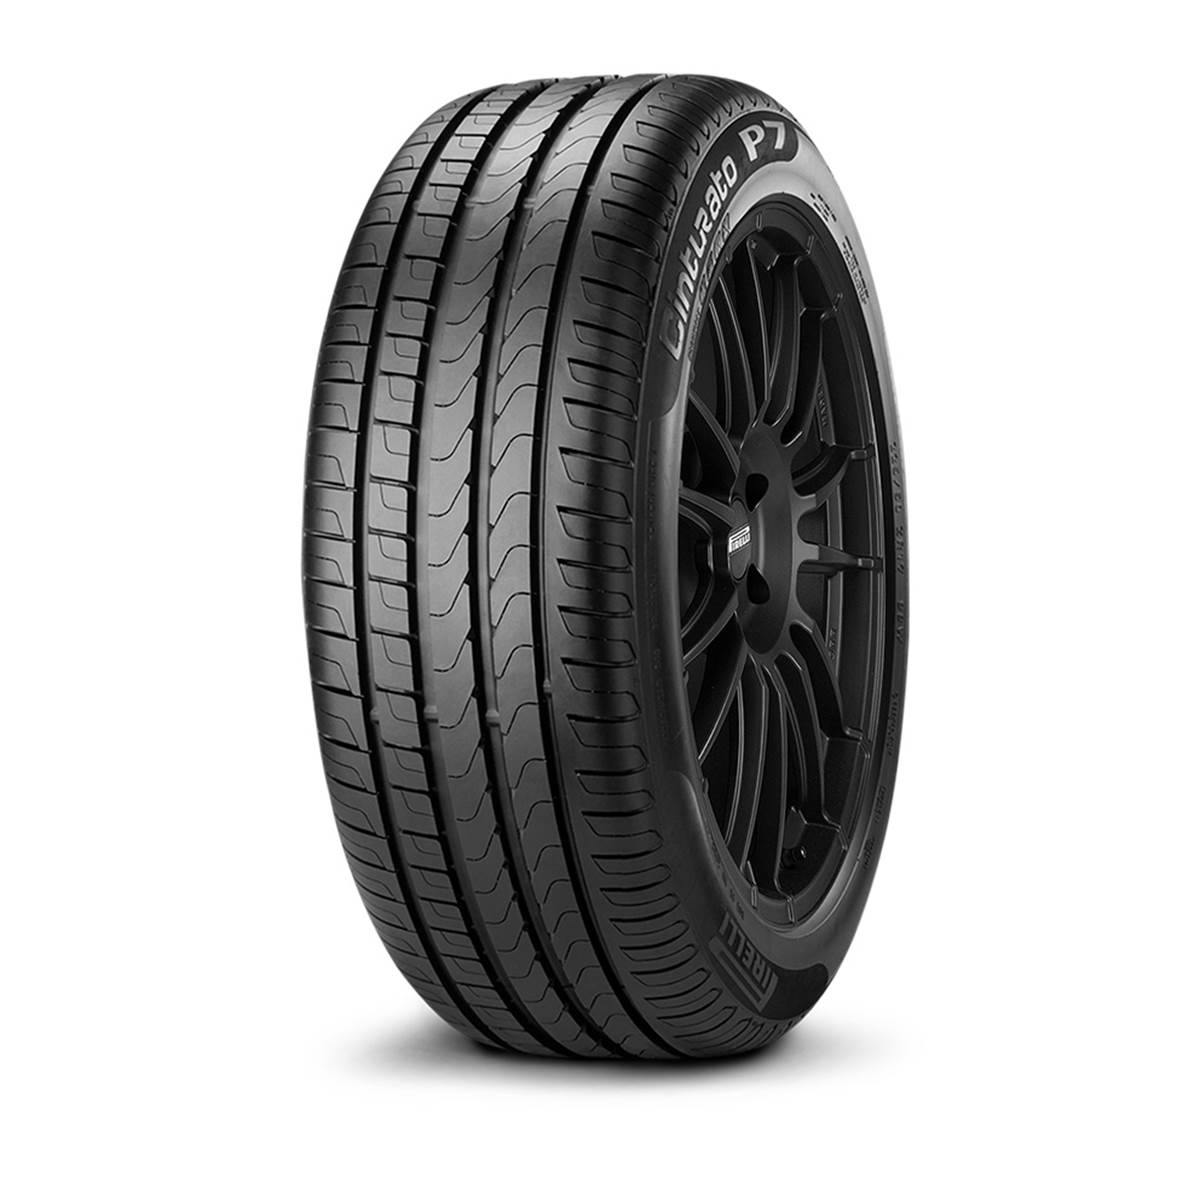 Pneu Pirelli 245/40R17 91W Cinturato P7